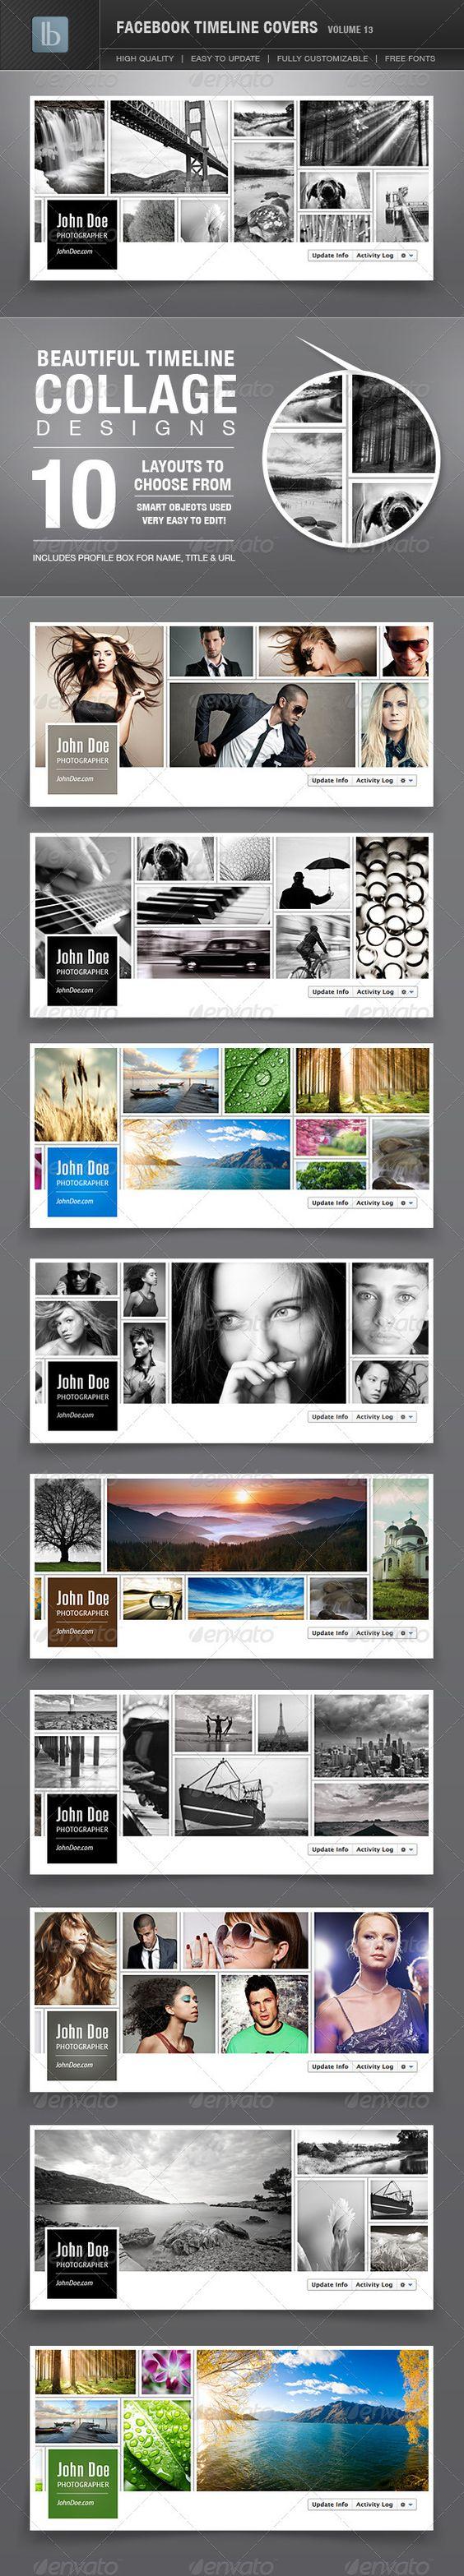 Facebook Timeline Covers | Volume 13 - GraphicRiver Item for Sale